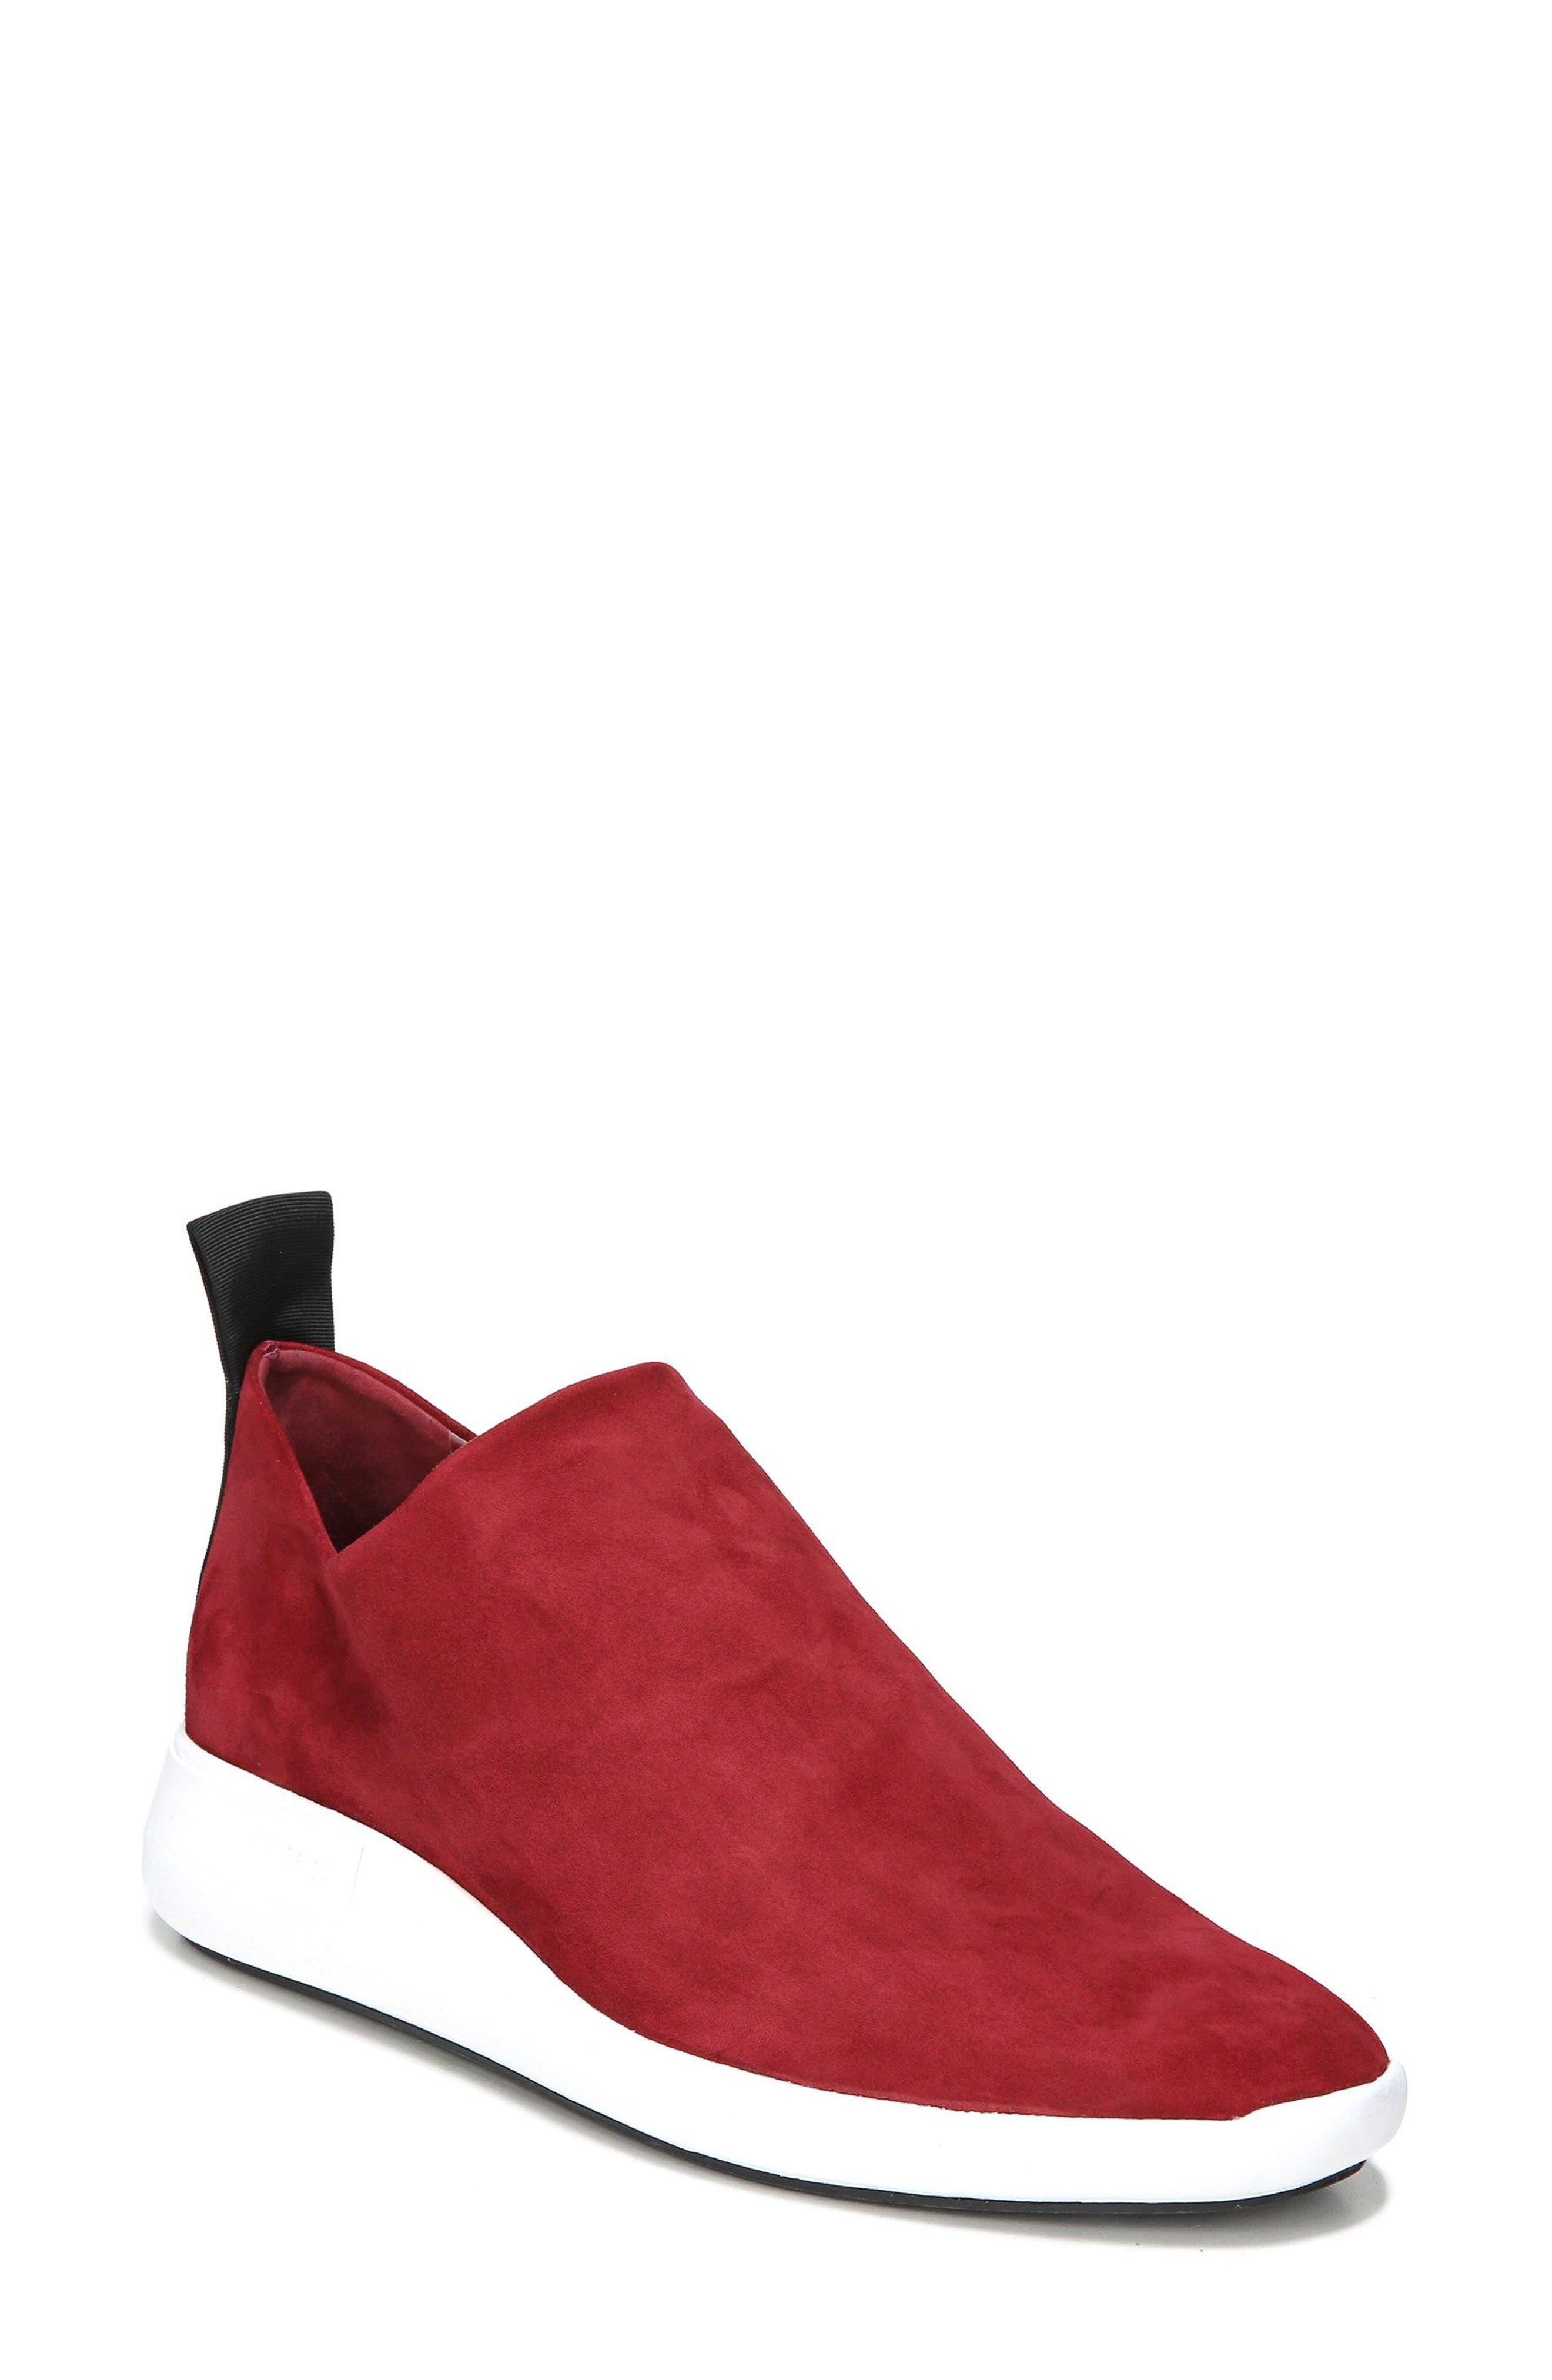 Marlow Slip-On Sneaker,                             Main thumbnail 3, color,